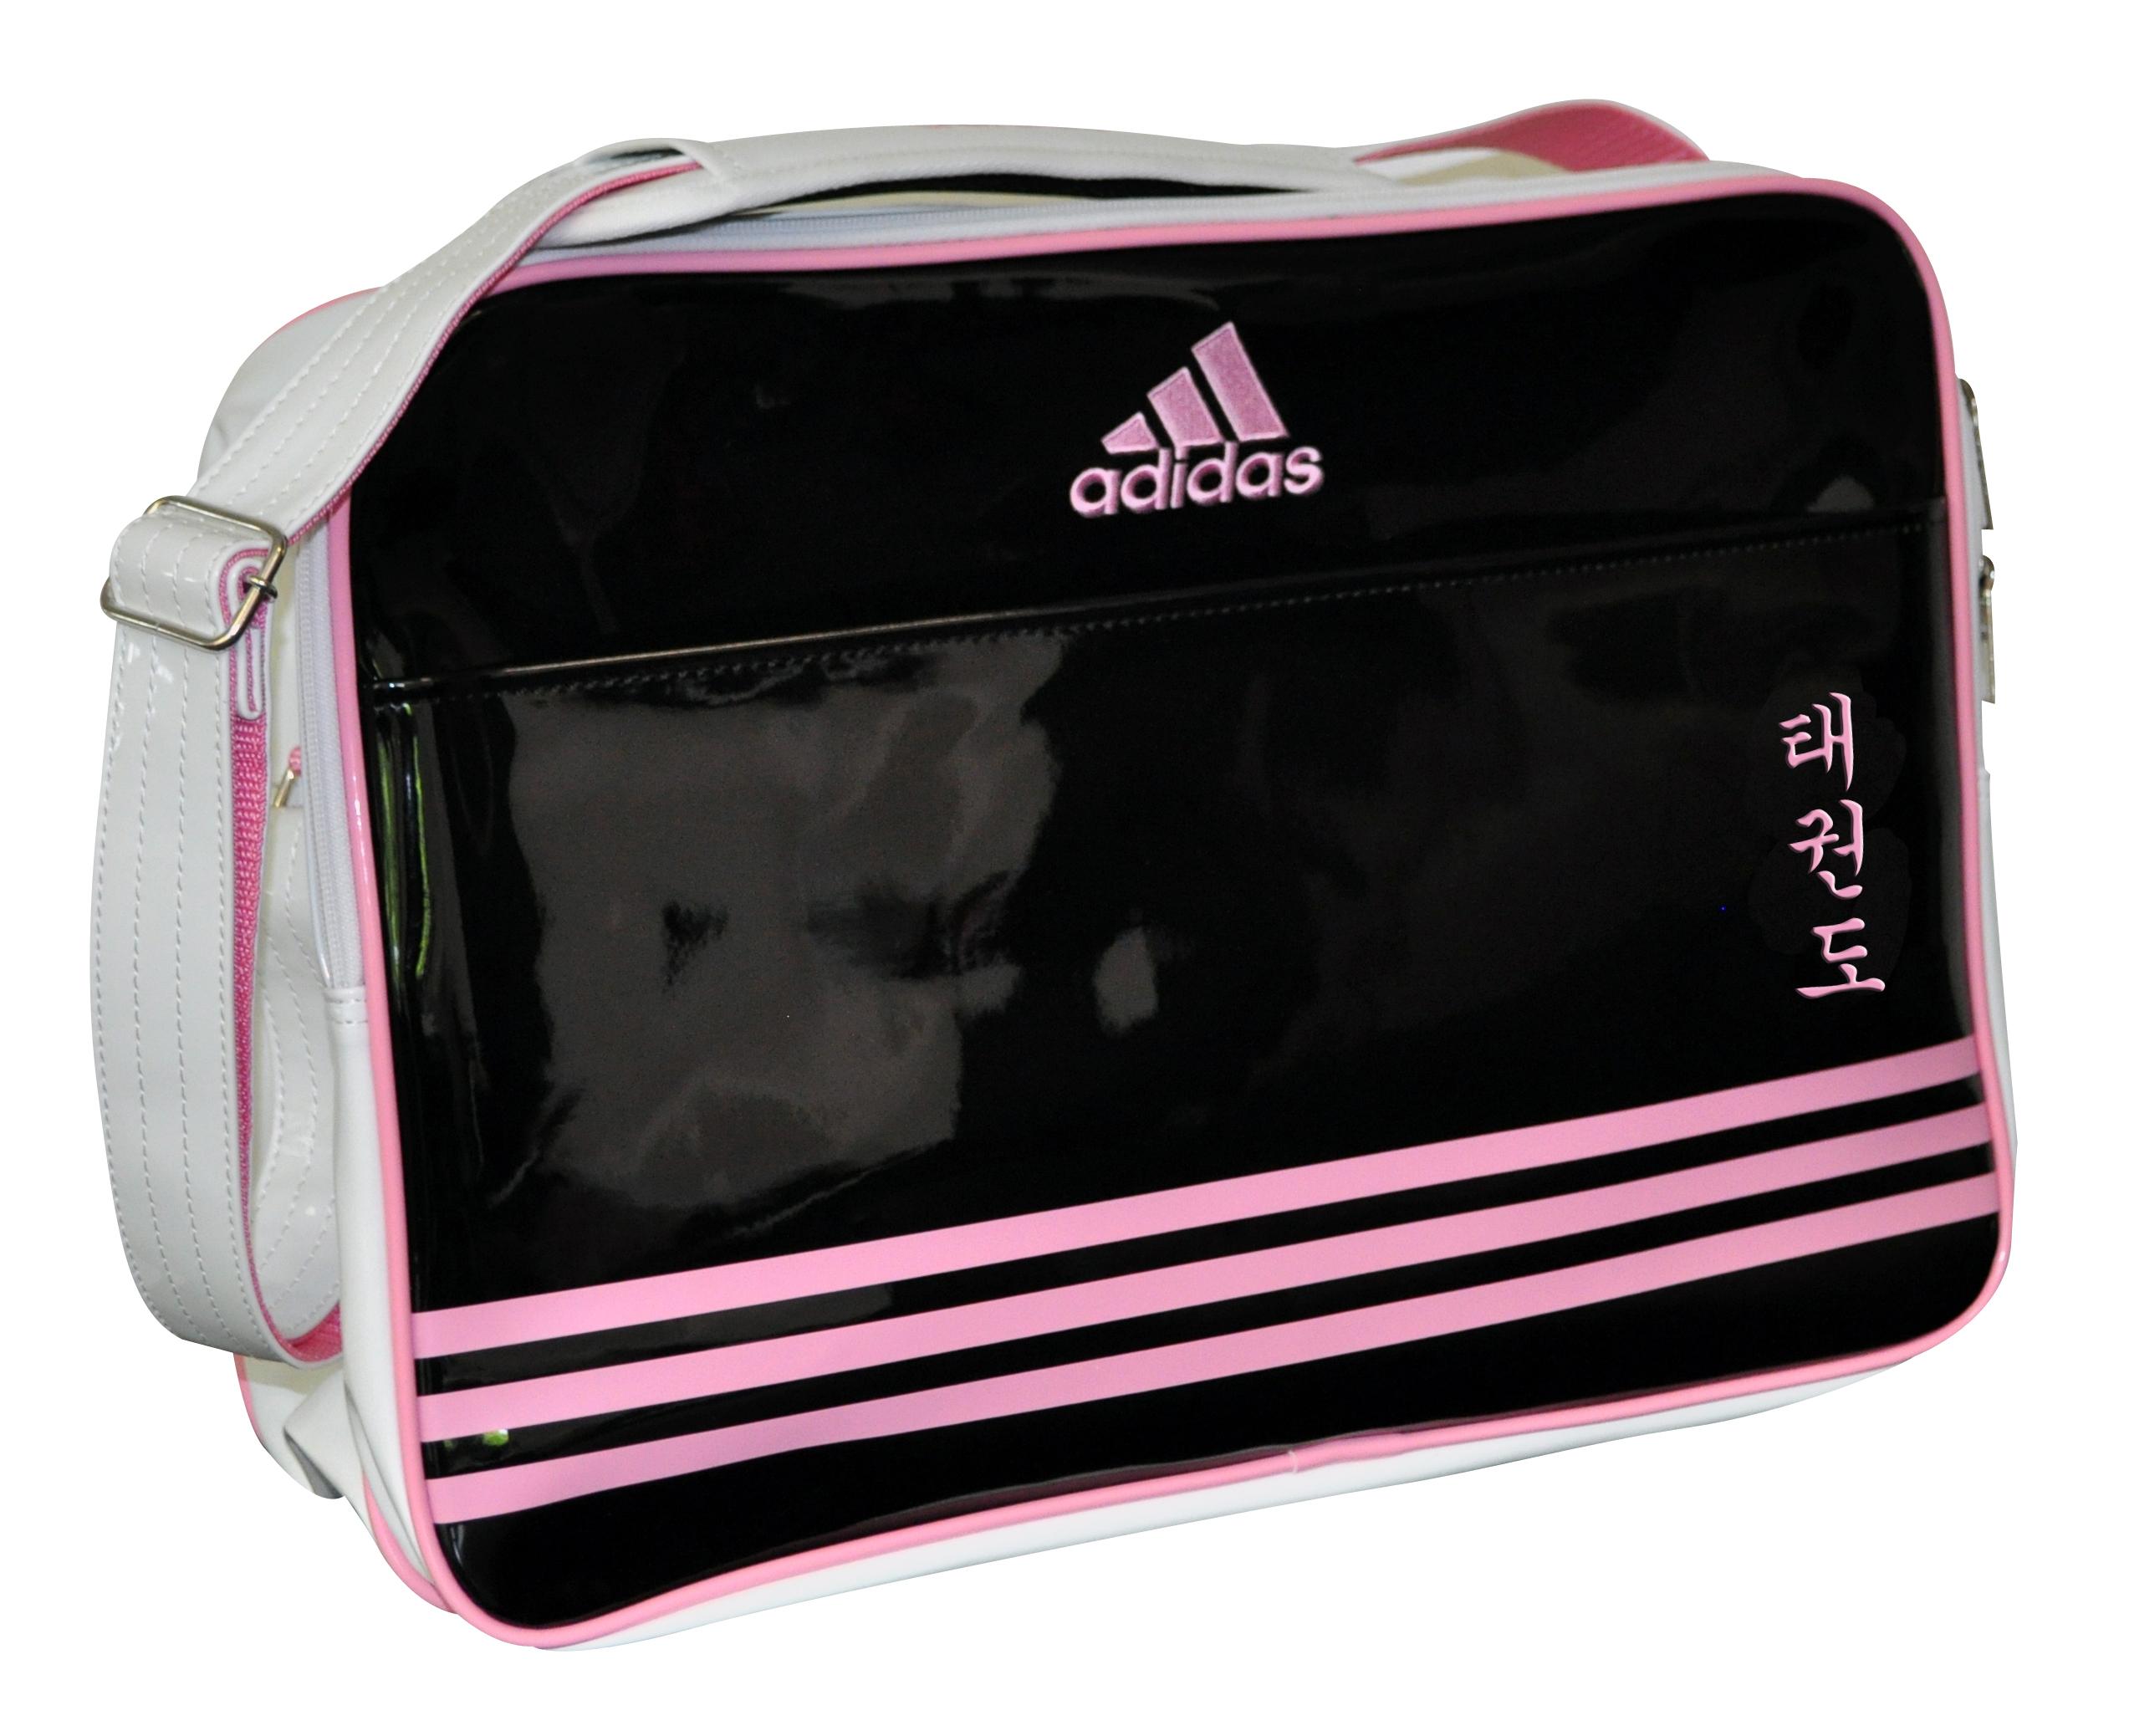 Image of   Adidas Retro Taekwondo Sports taske - 46 x 32 x 19 cm - Sort / Pink